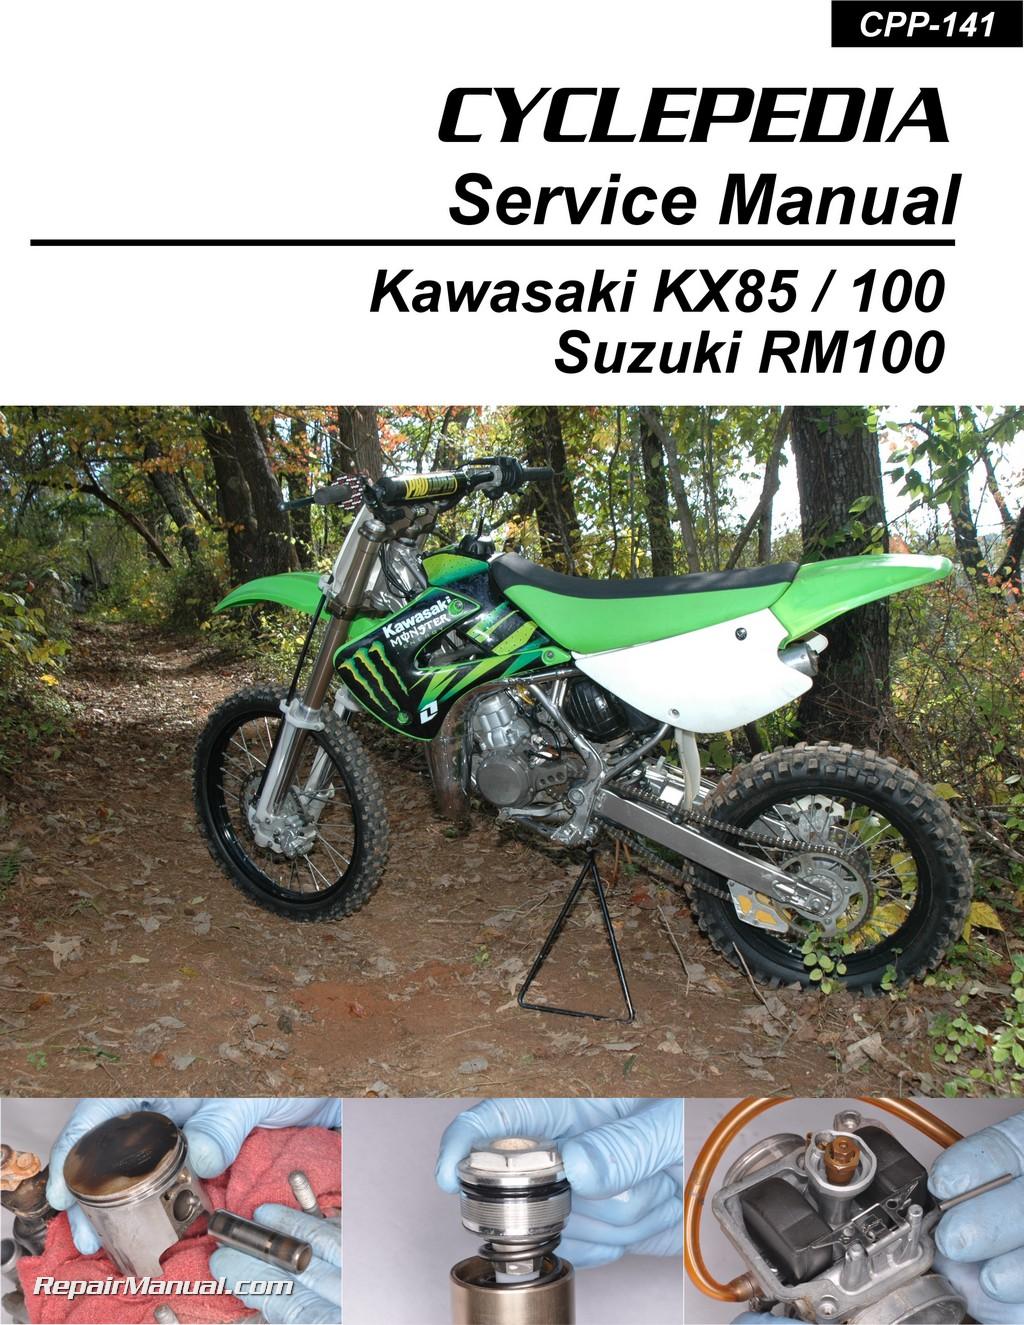 suzuki b 100 p owners manual